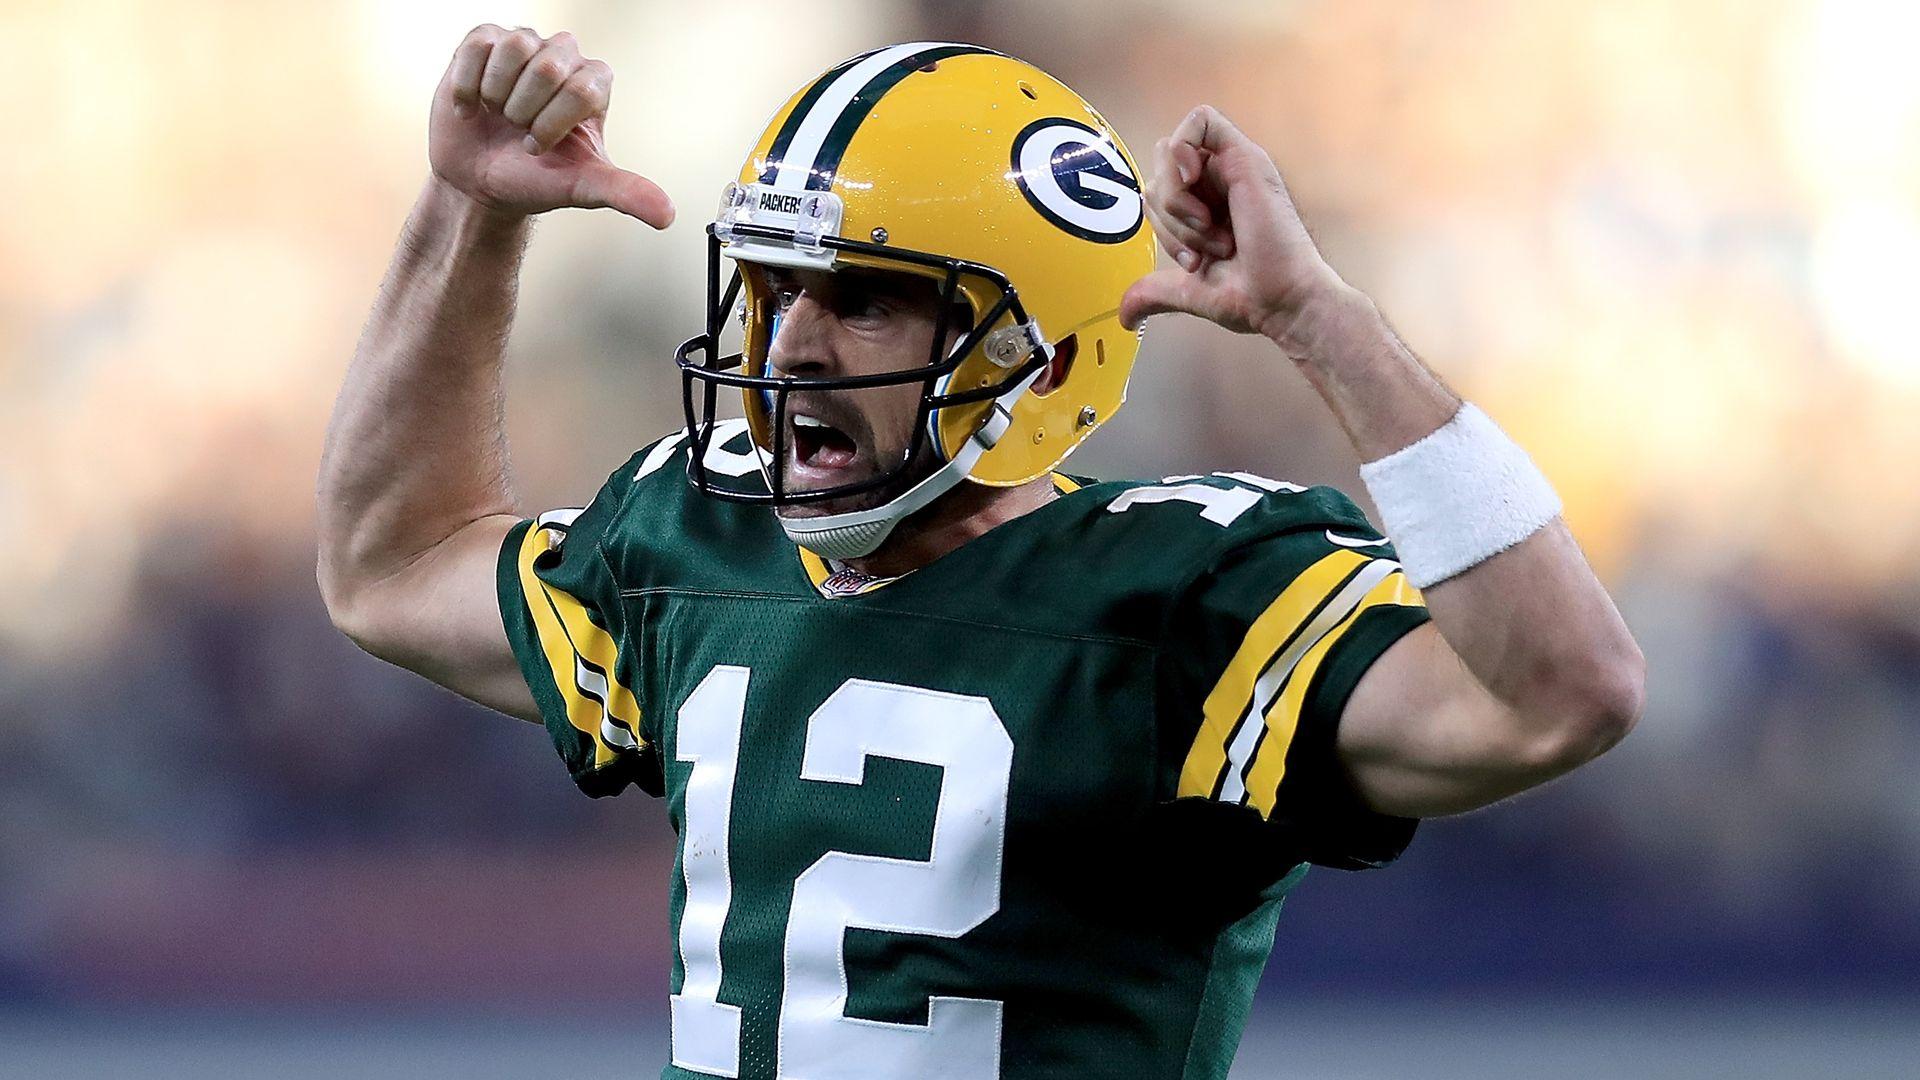 Greenbay Packers quarterback Aaron Rodgers